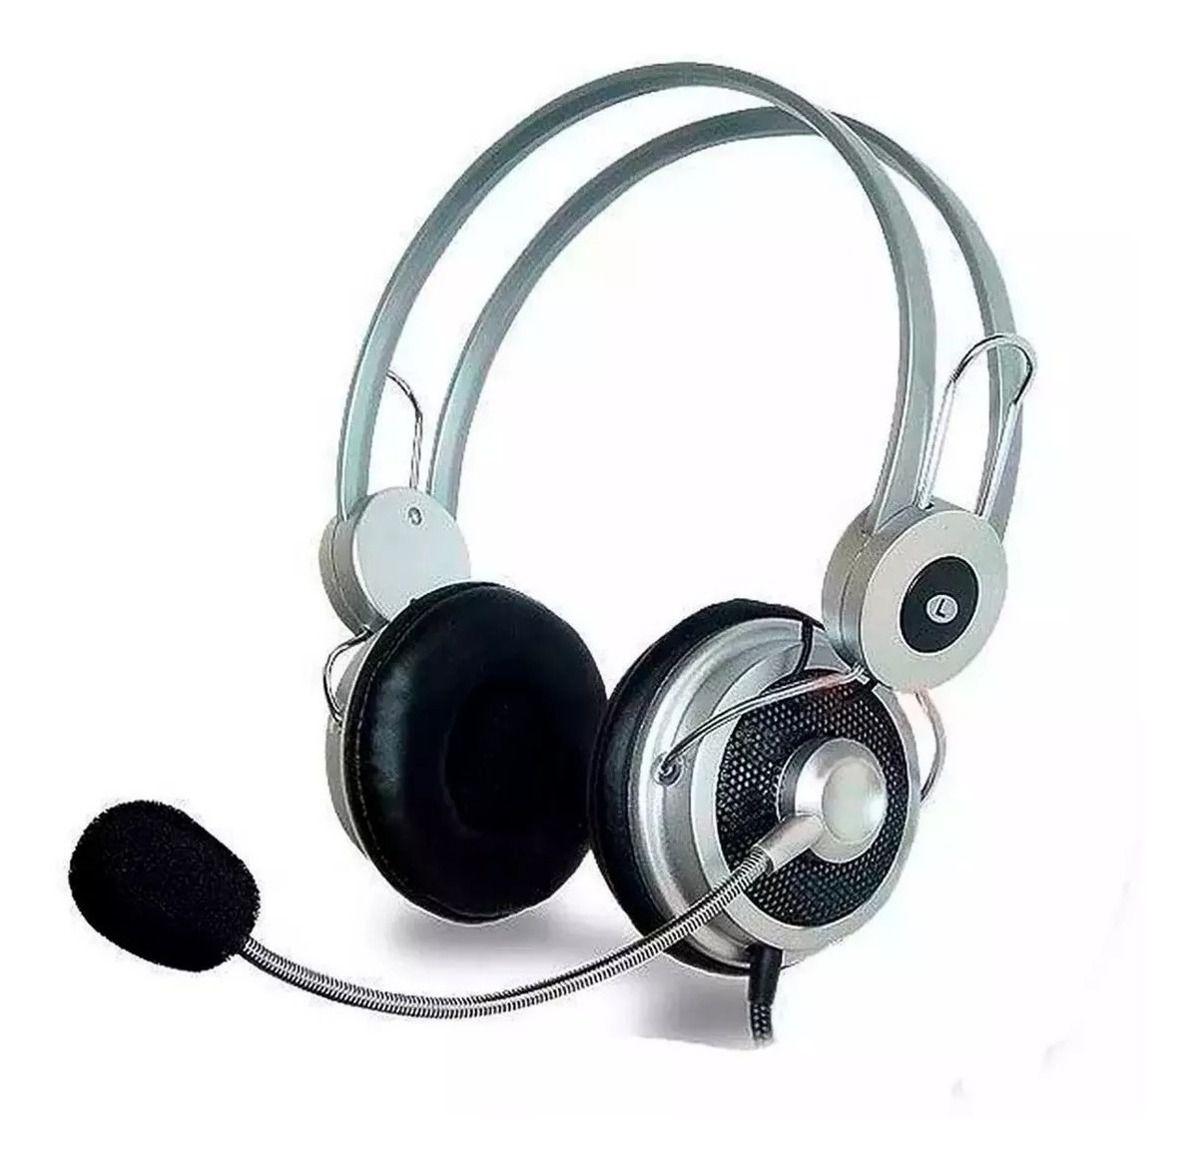 Fone de Ouvido Headset Infokit Hiper Música Hm-610mv